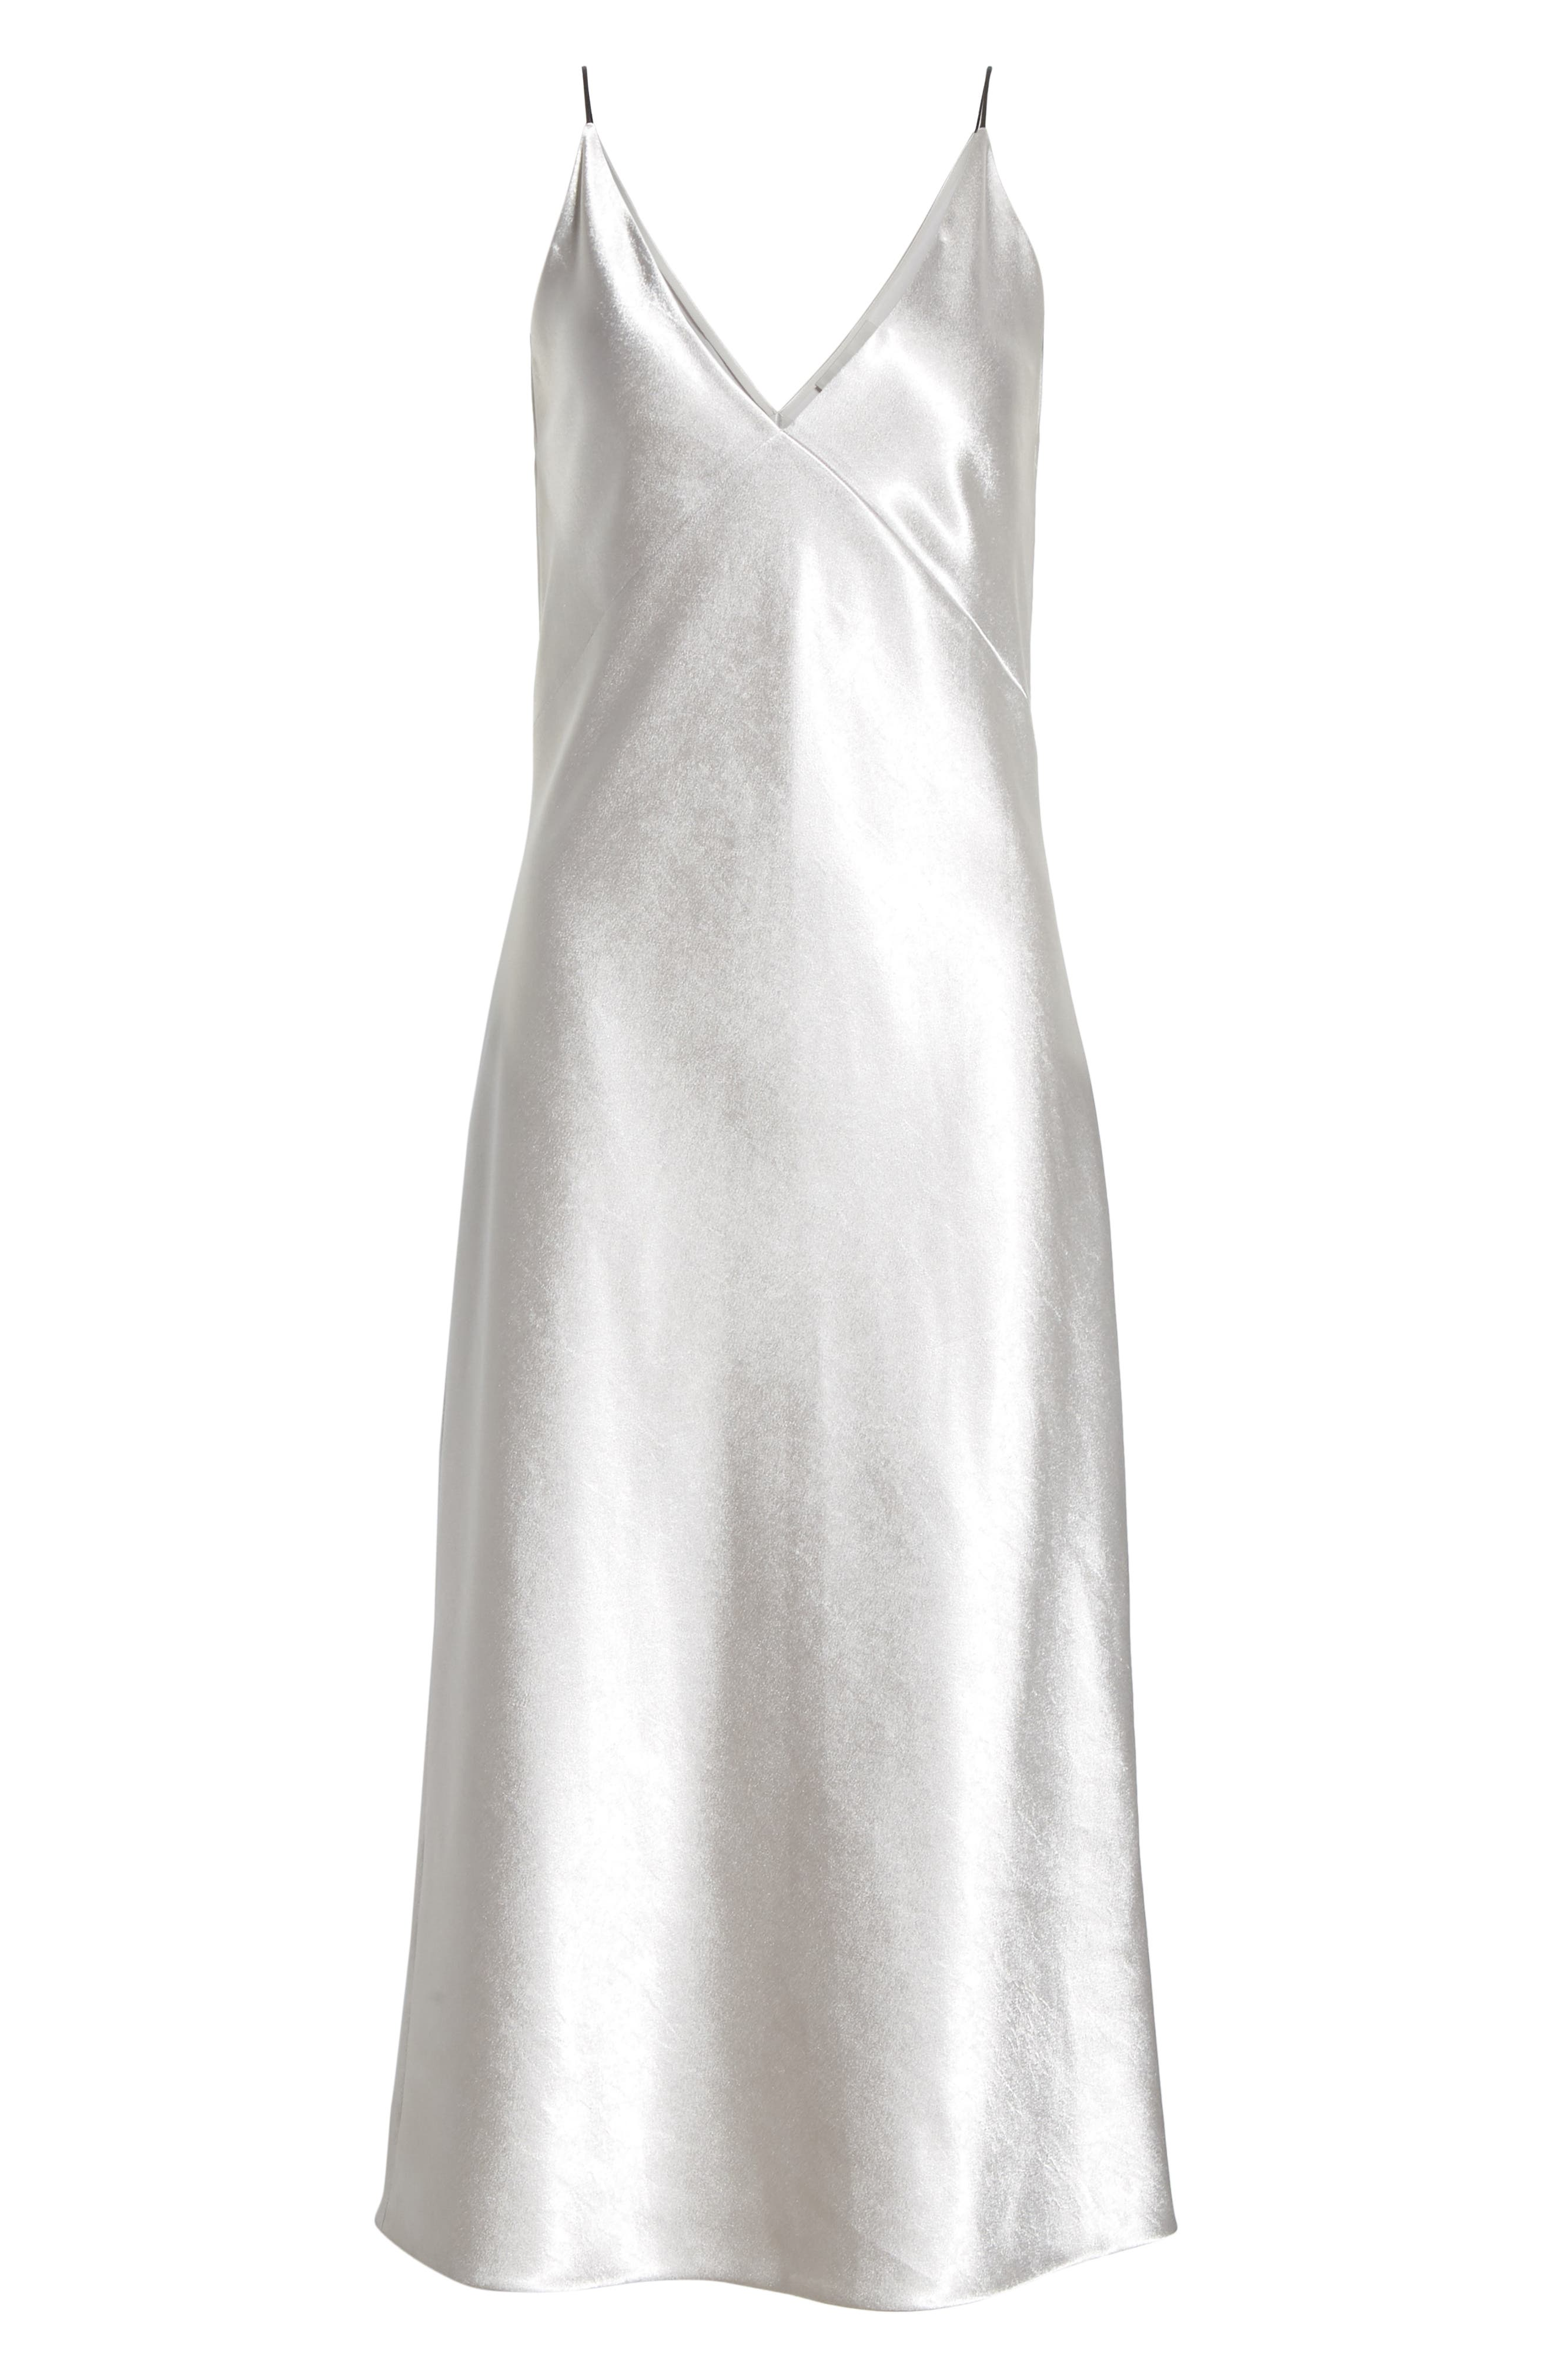 V-neck Bias Cut Dress,                             Alternate thumbnail 7, color,                             SILVER